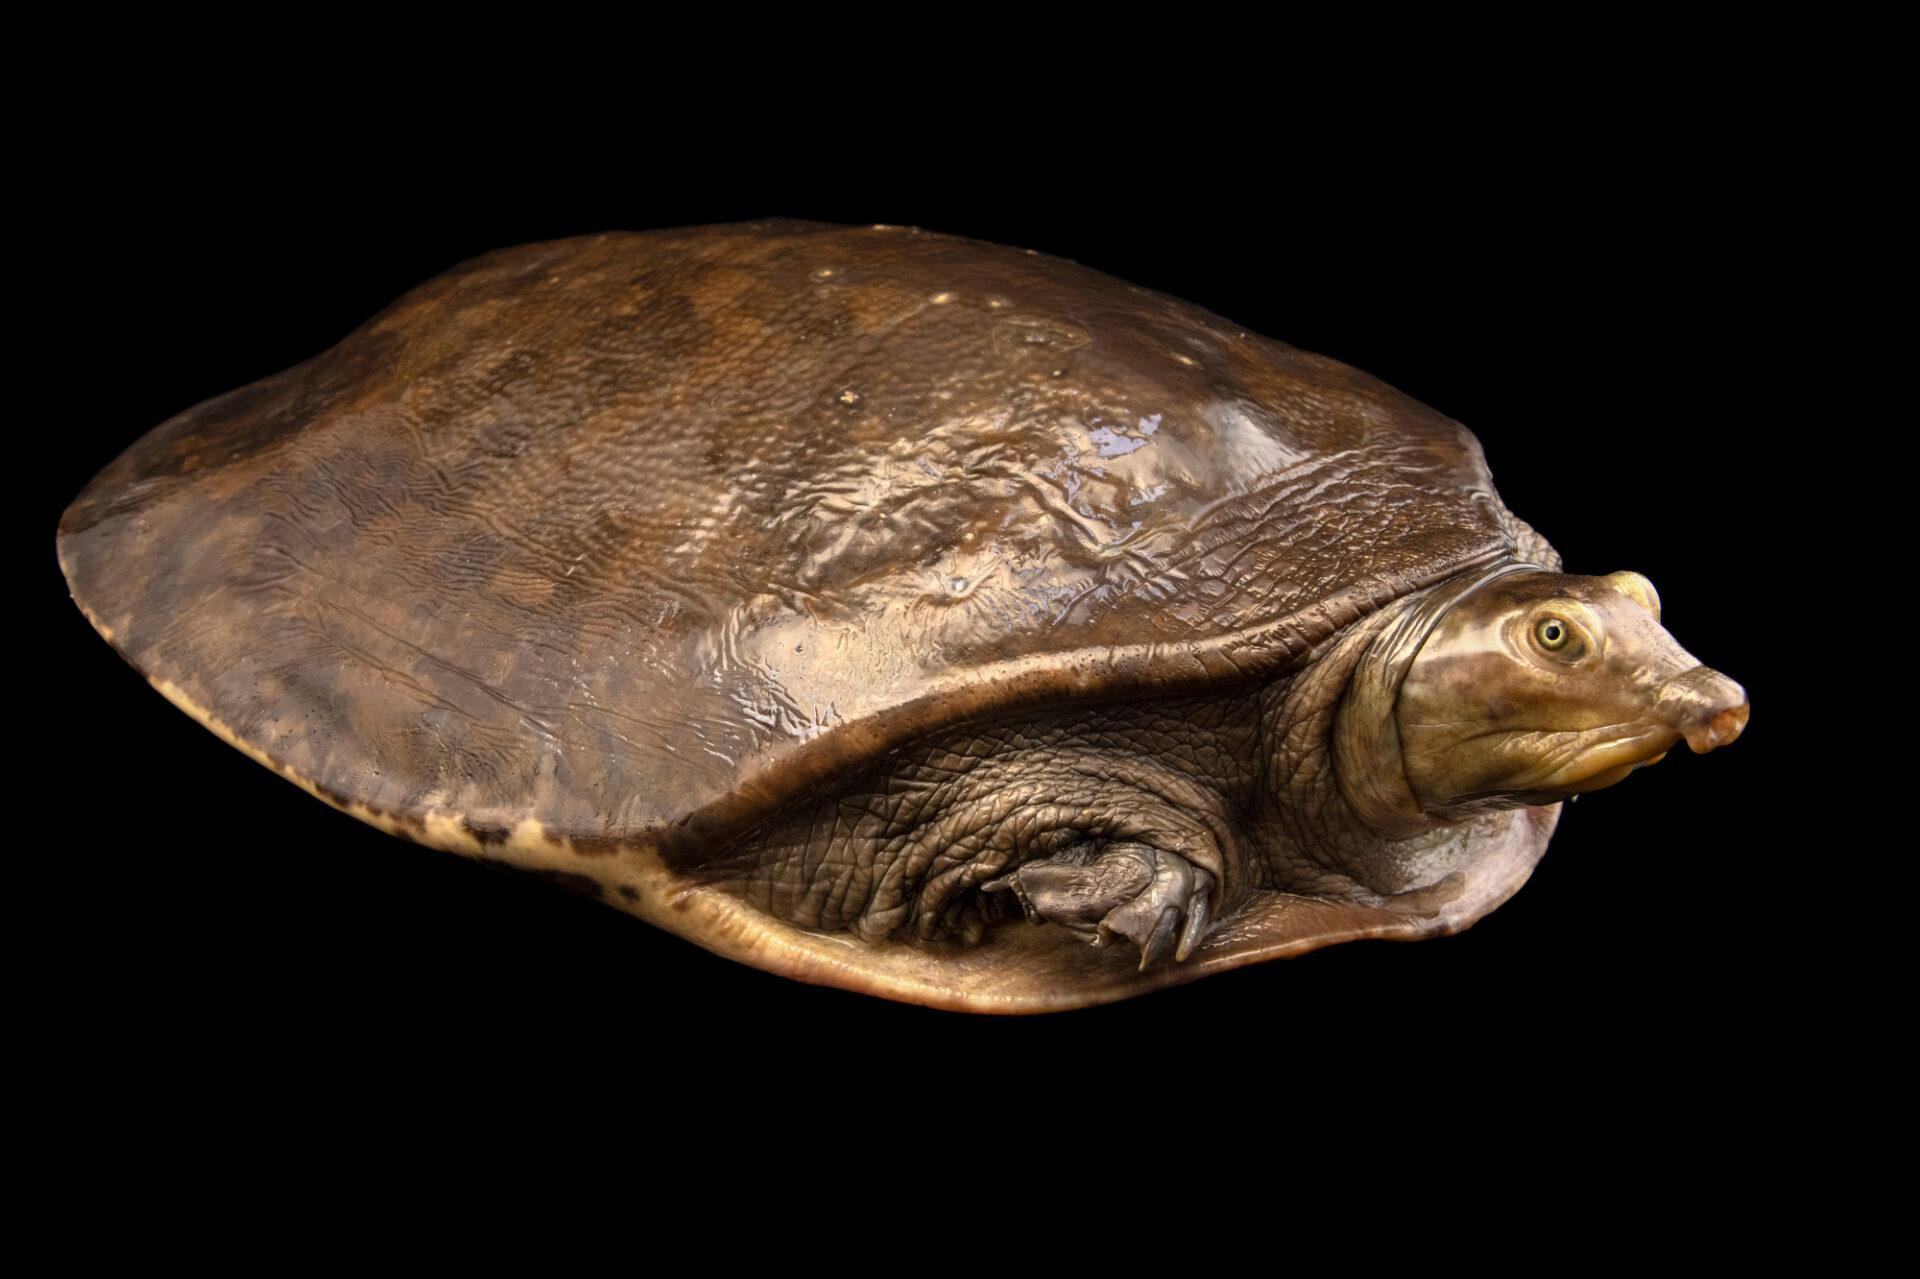 Photo: A Senegal flapshell turtle (Cyclanorbis senegalensis) at Safari Park Dvur Kralove.